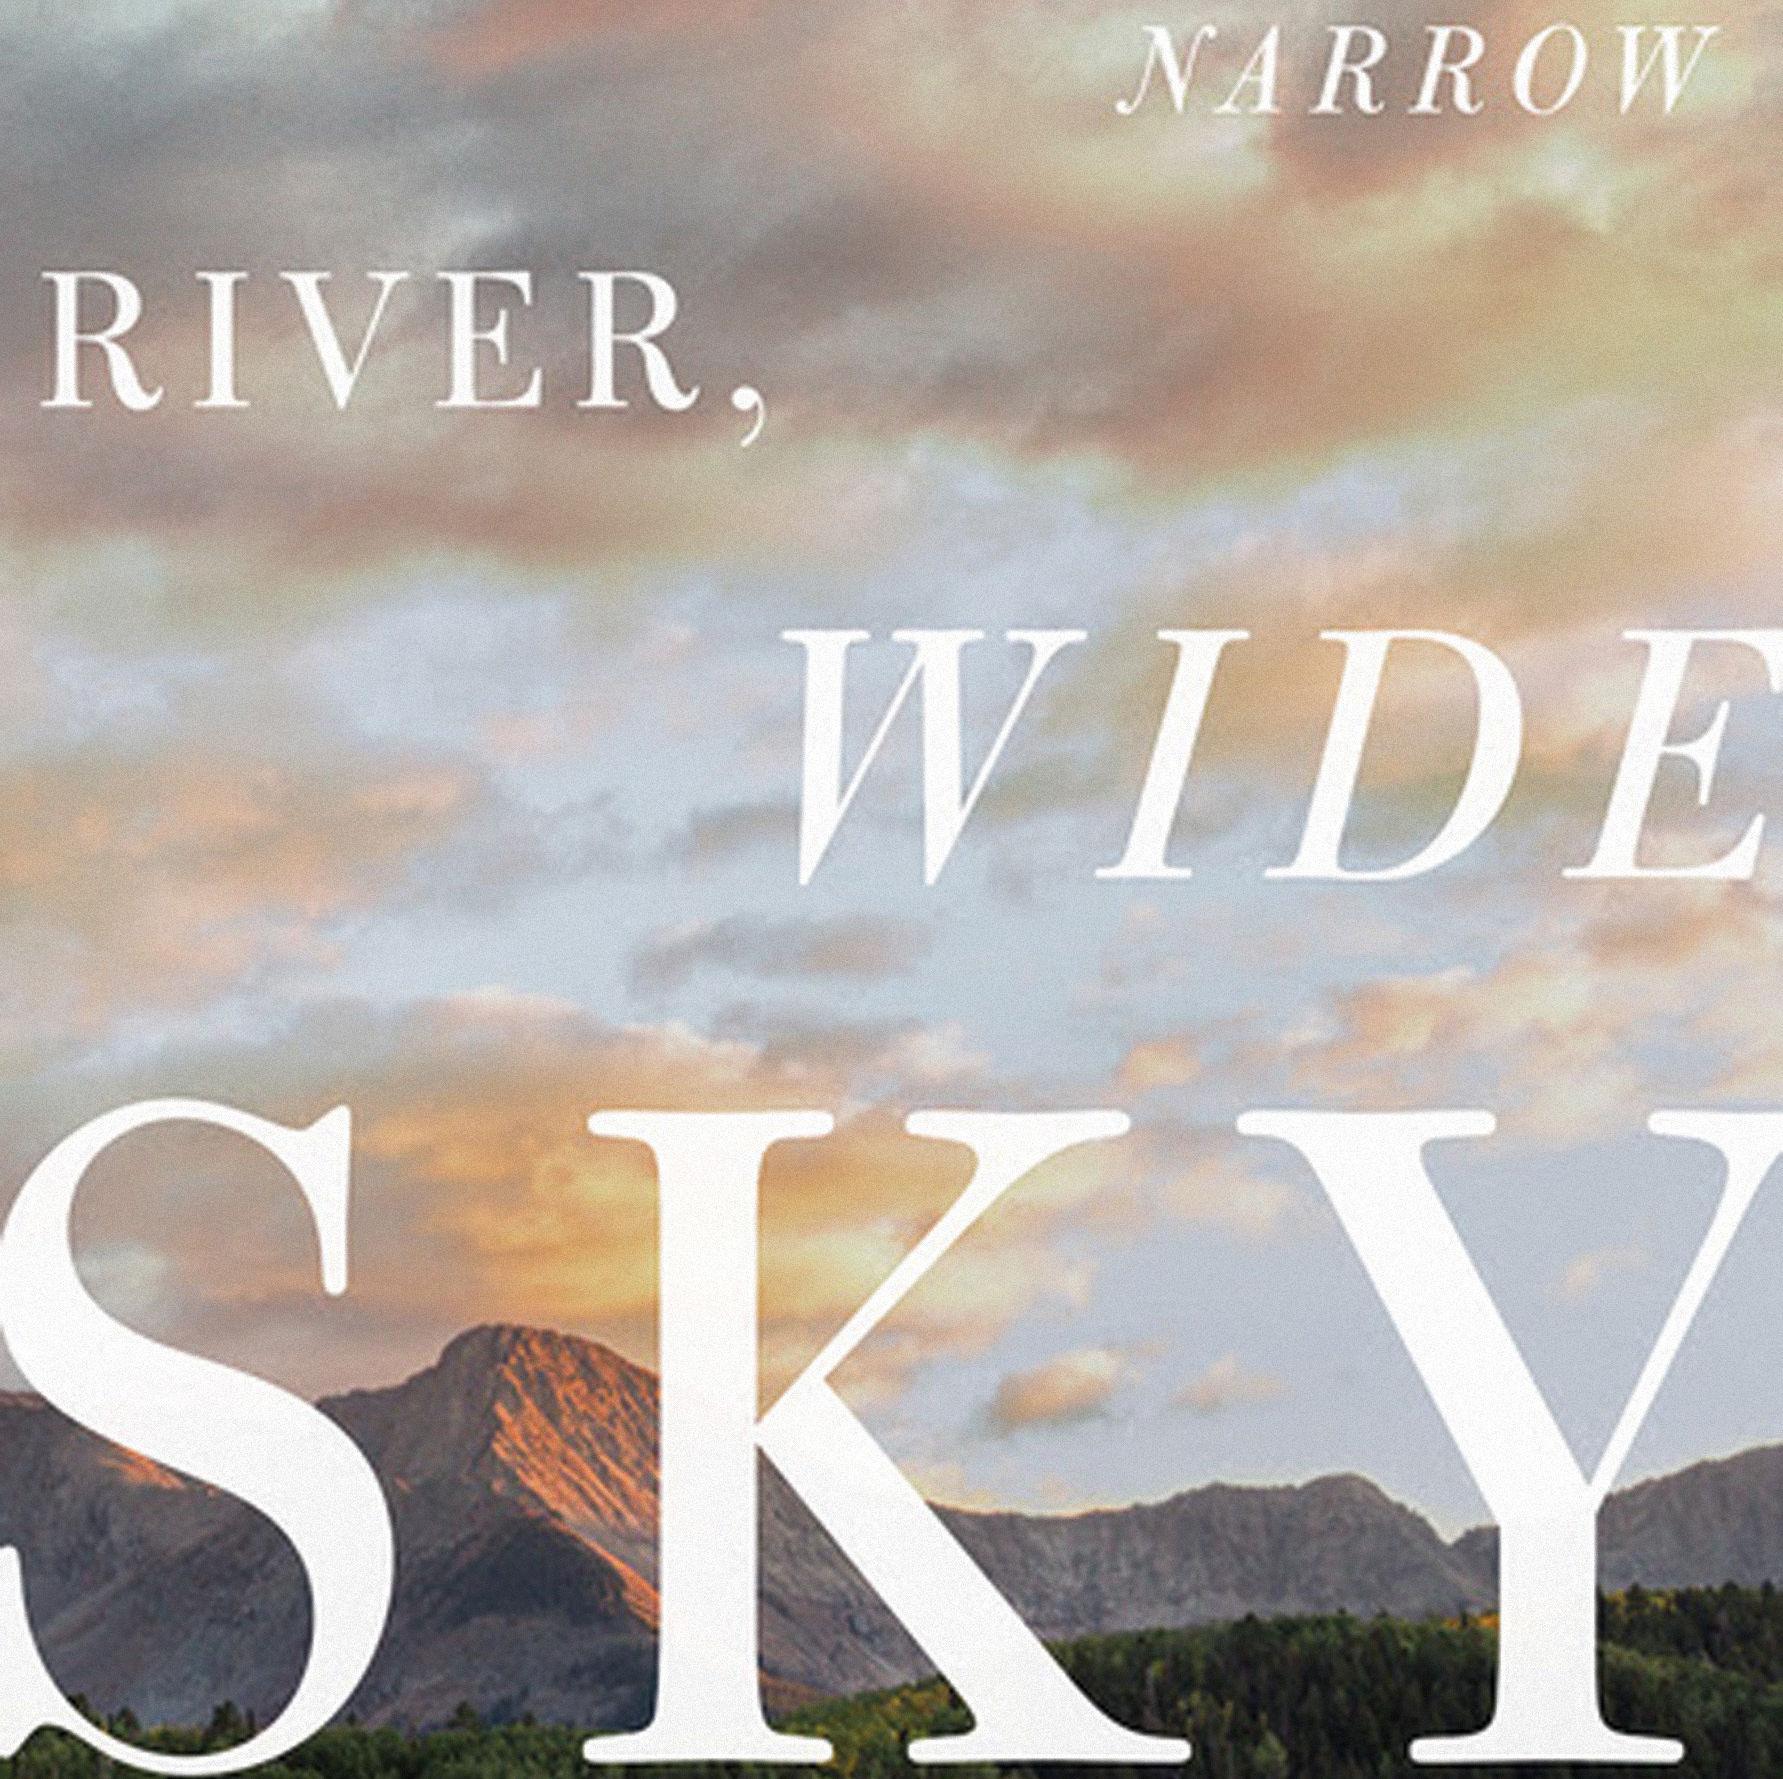 Pomo 0517 jenny forrester narrow river wide sky qjqtpj